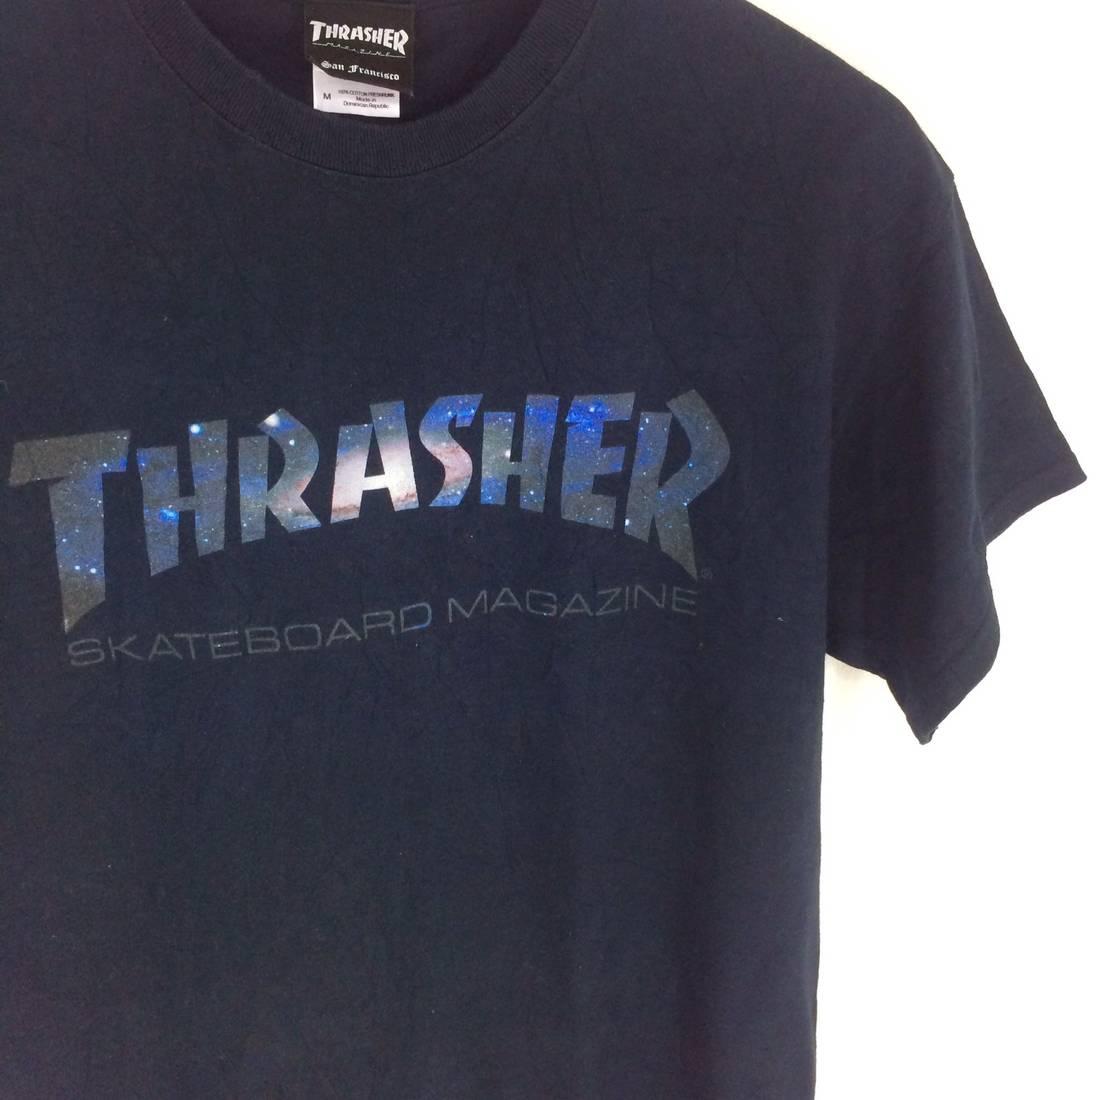 Rare Design Thrasher T-shirt